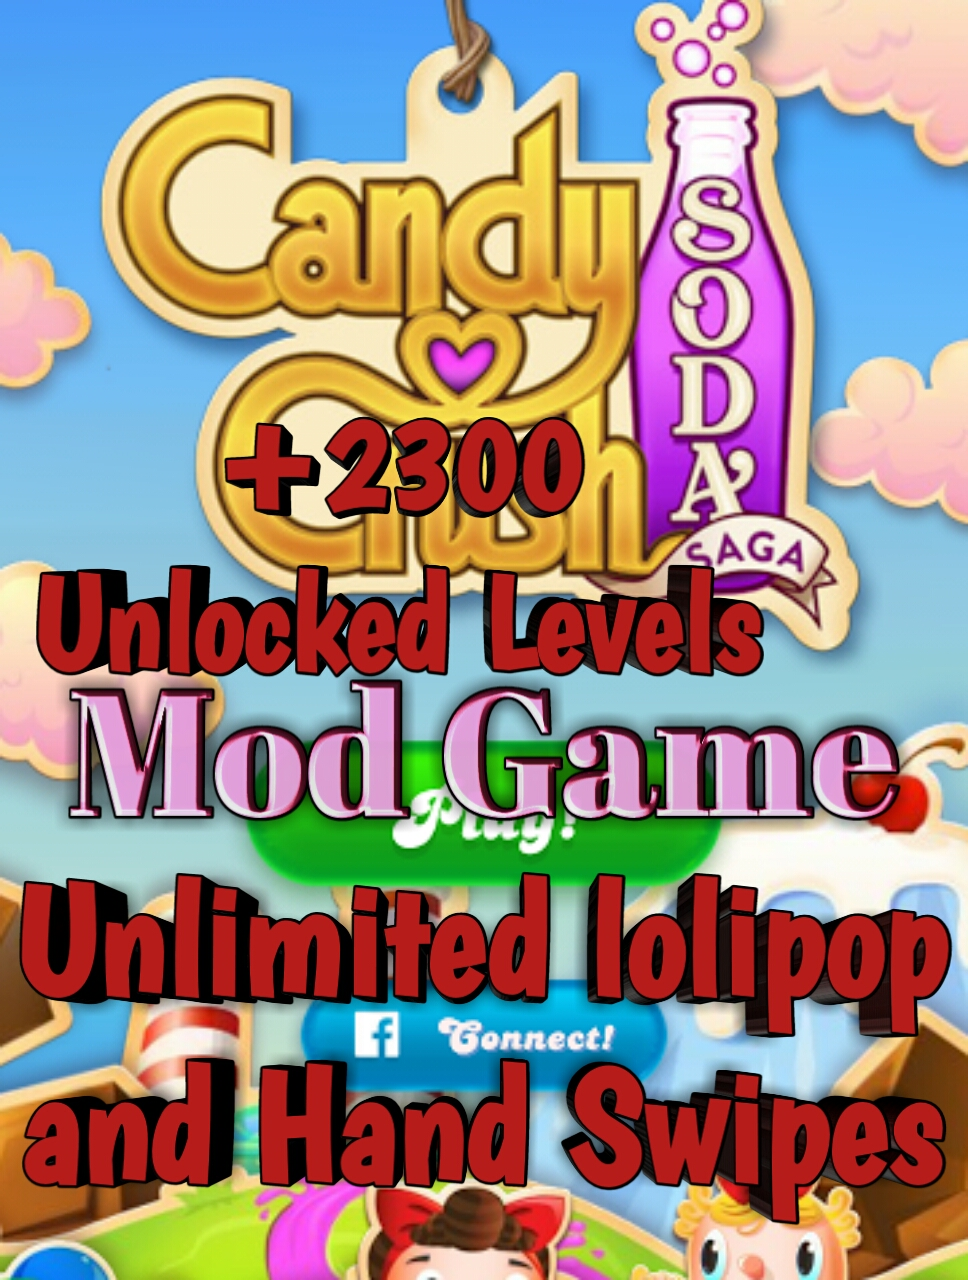 Candy crush soda saga game unlimited lollipop and hand - 1600 candy crush ...